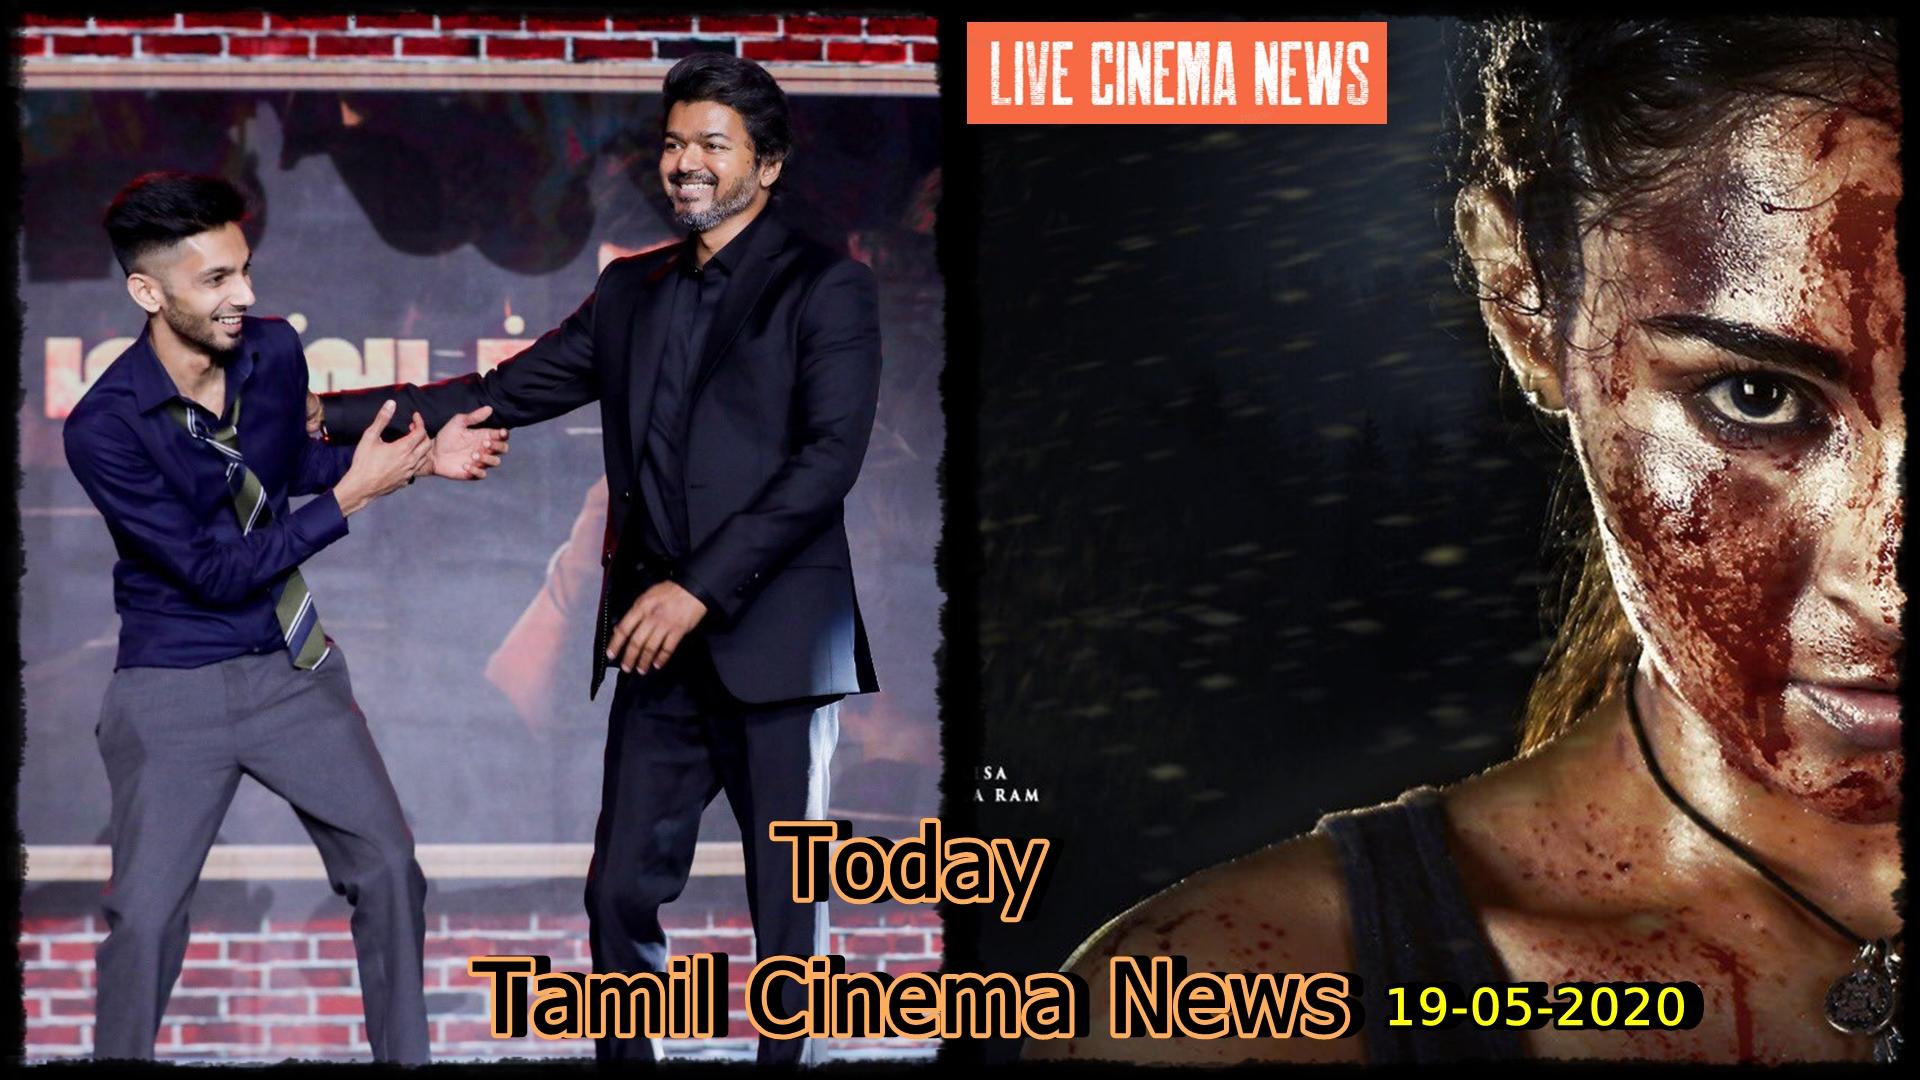 Today Tamil Cinema News 19-05-2020